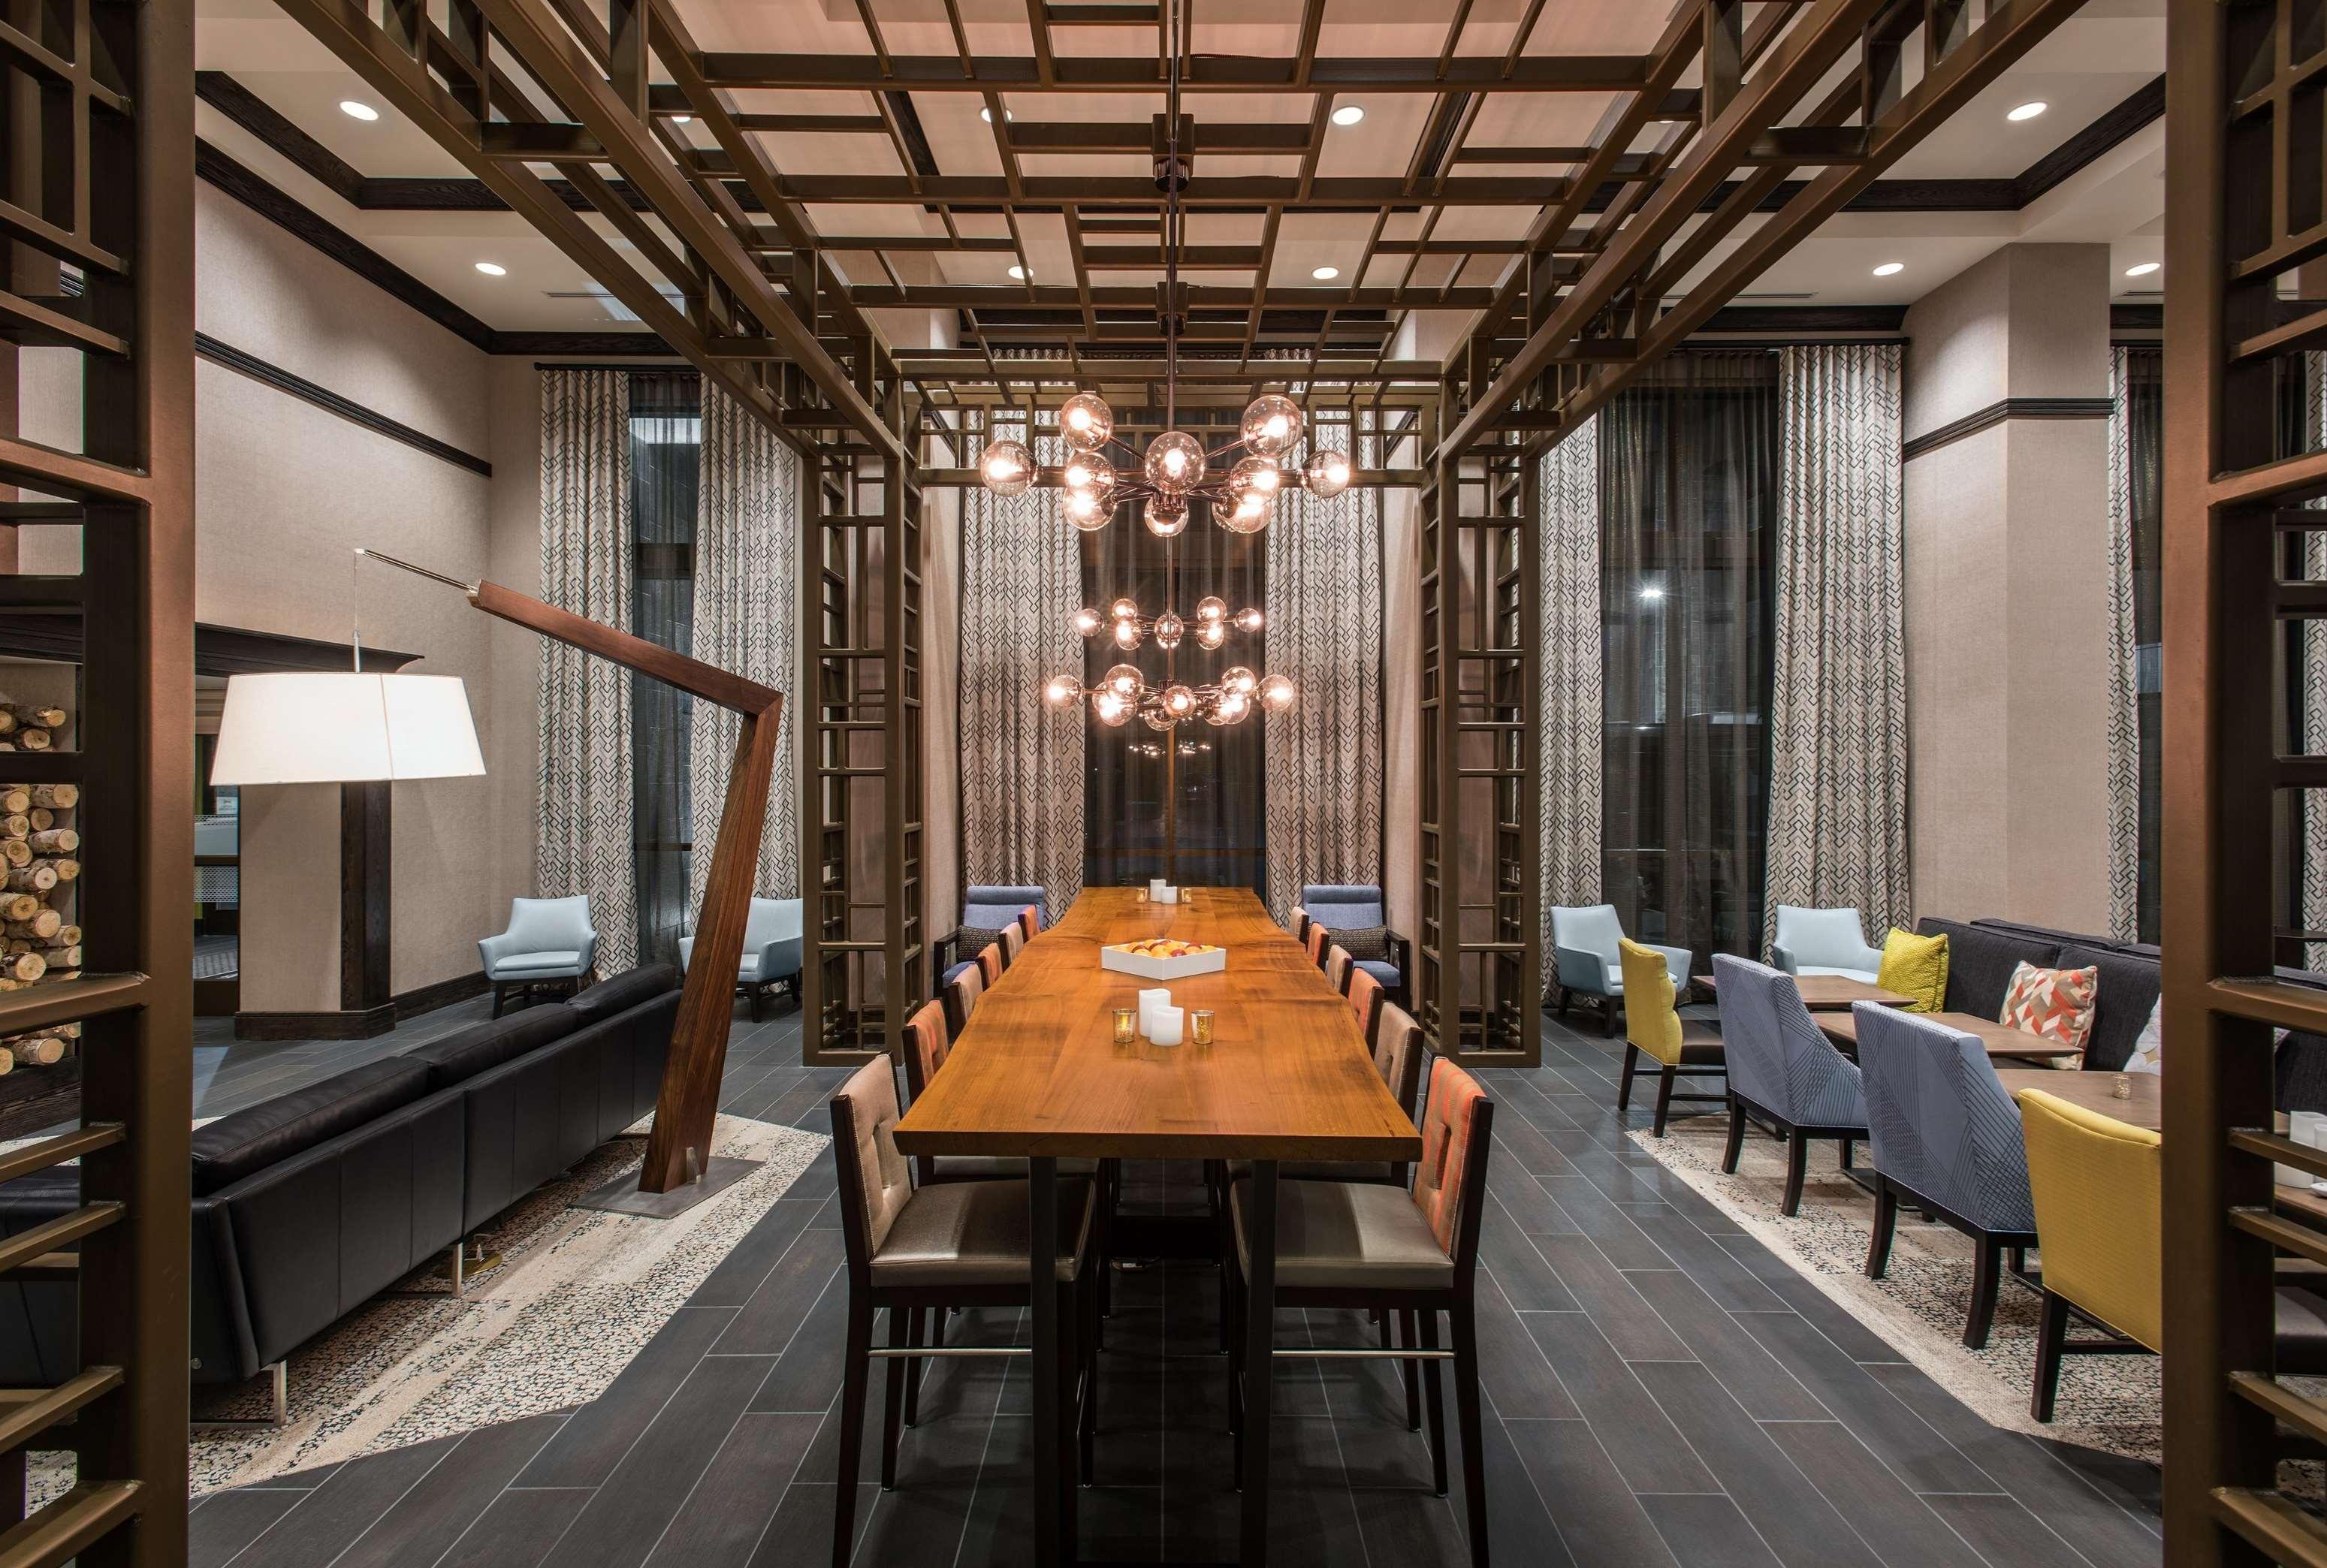 Hampton Inn & Suites Napa image 10